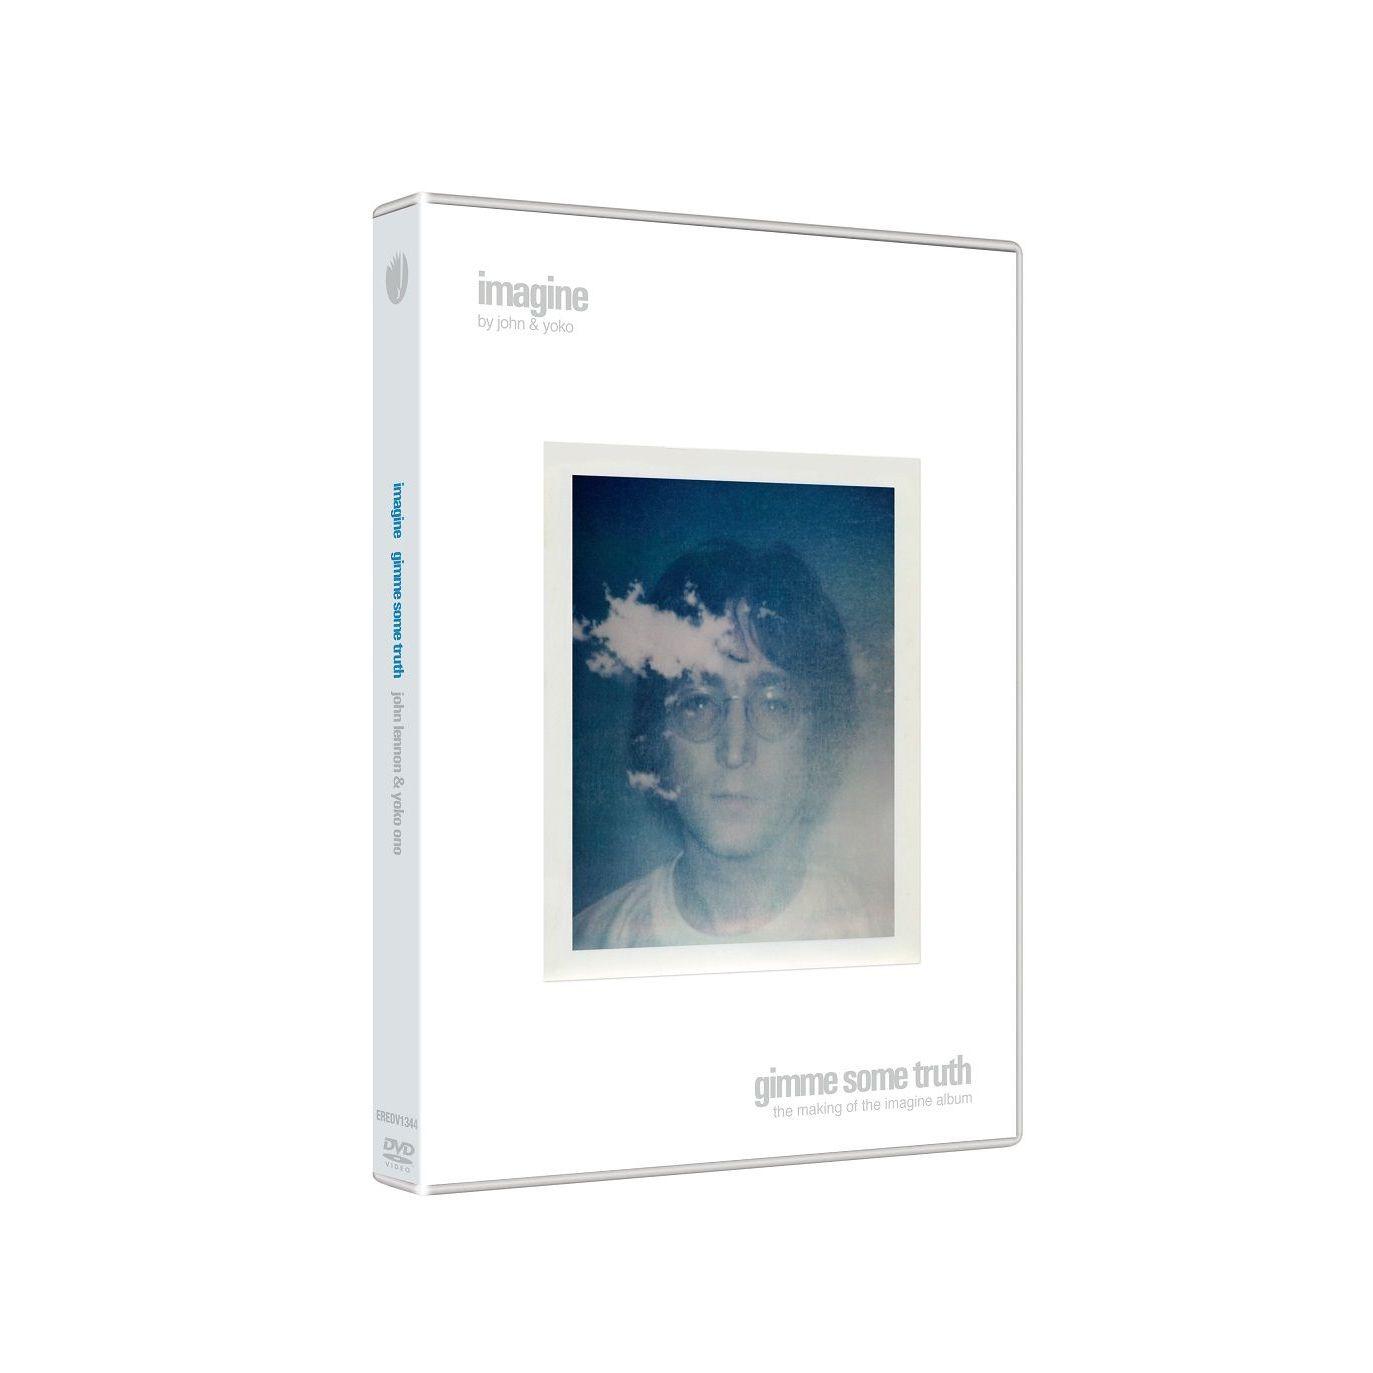 JOHN LENNON & YOKO ONO / ジョン・レノン&ヨーコ・オノ / イマジン / ギミ・サム・トゥルース (DVD)